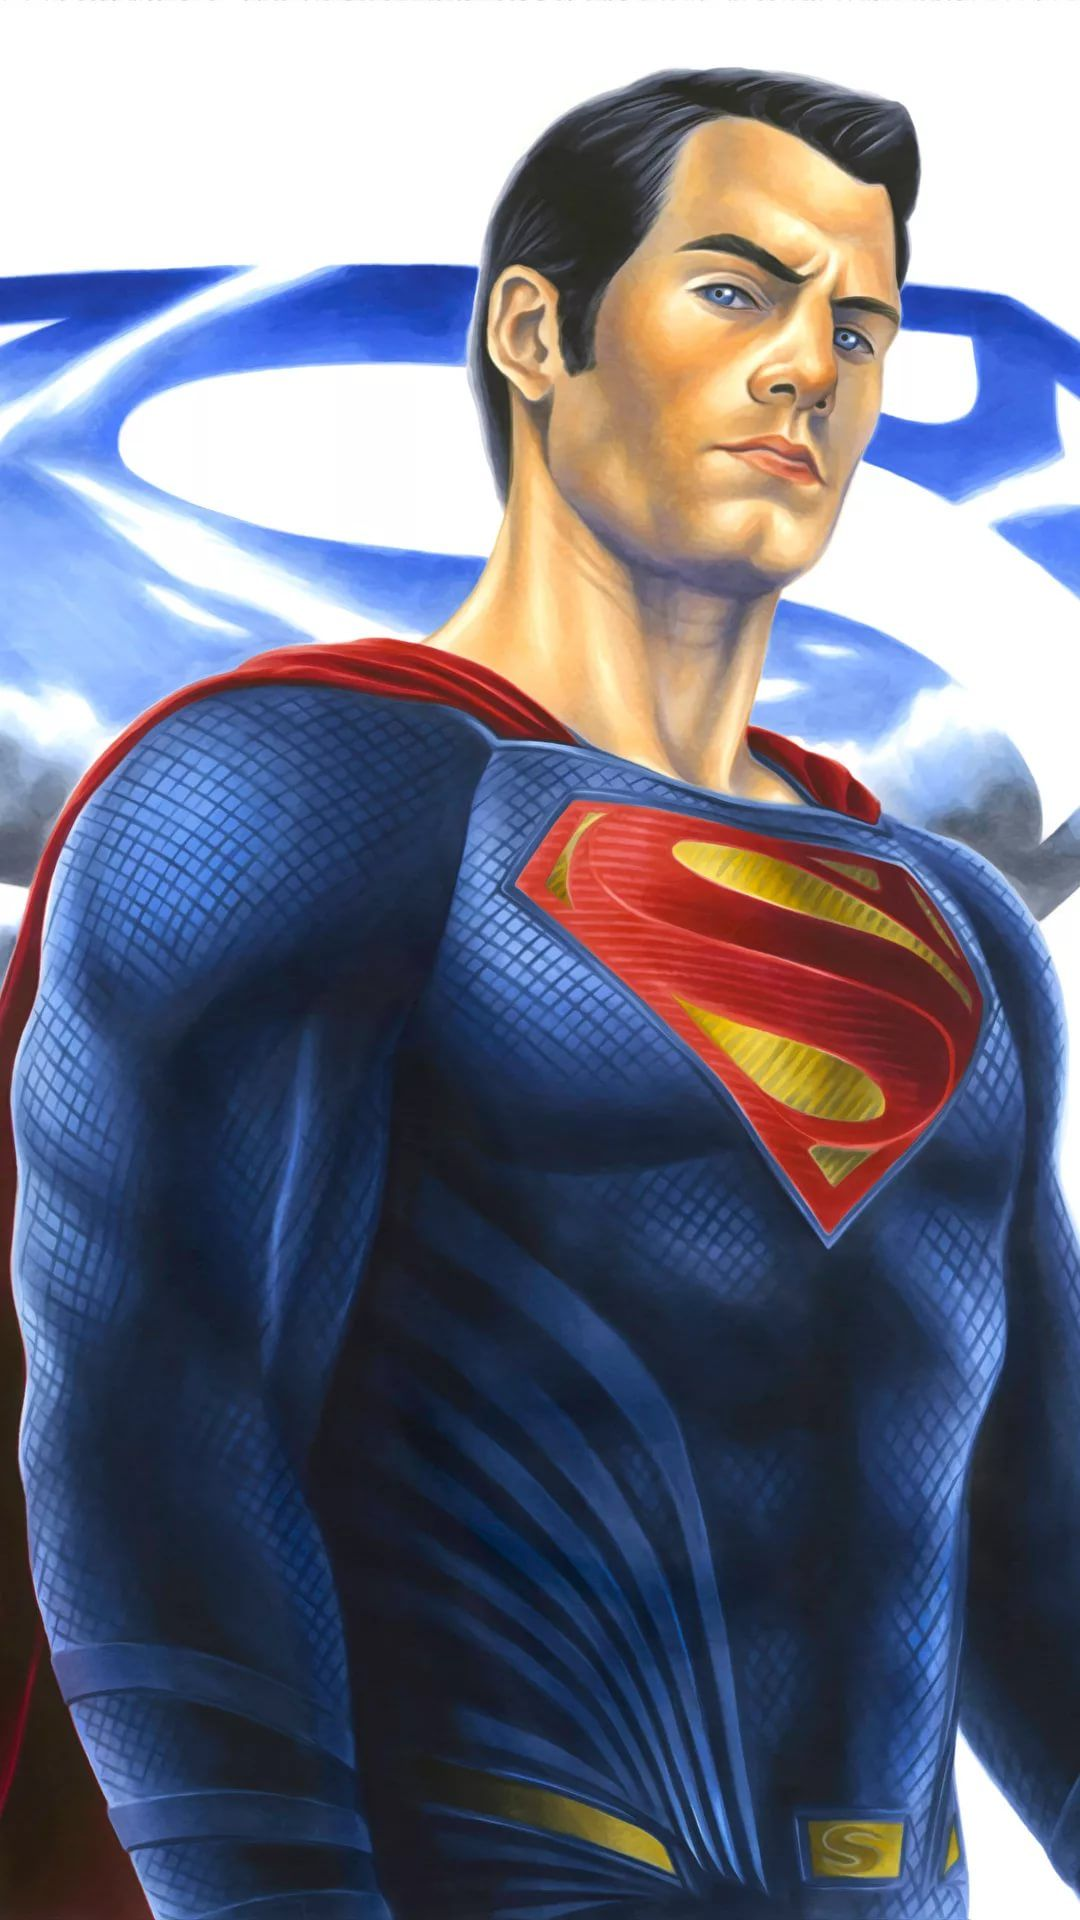 Superman iPhone xs wallpaper download